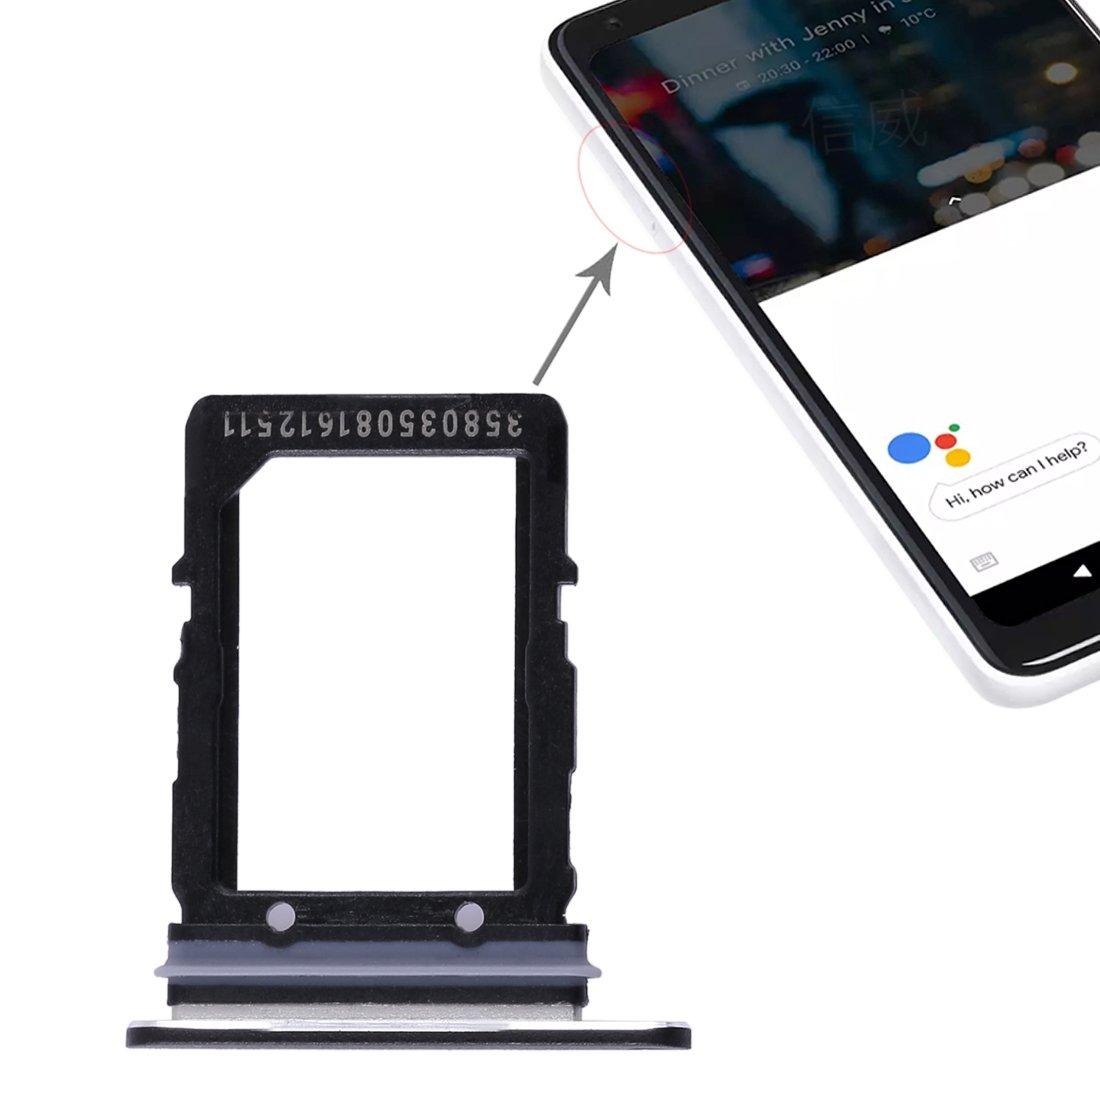 iPartsBuy SIM Card Tray for Google Pixel 2 XL